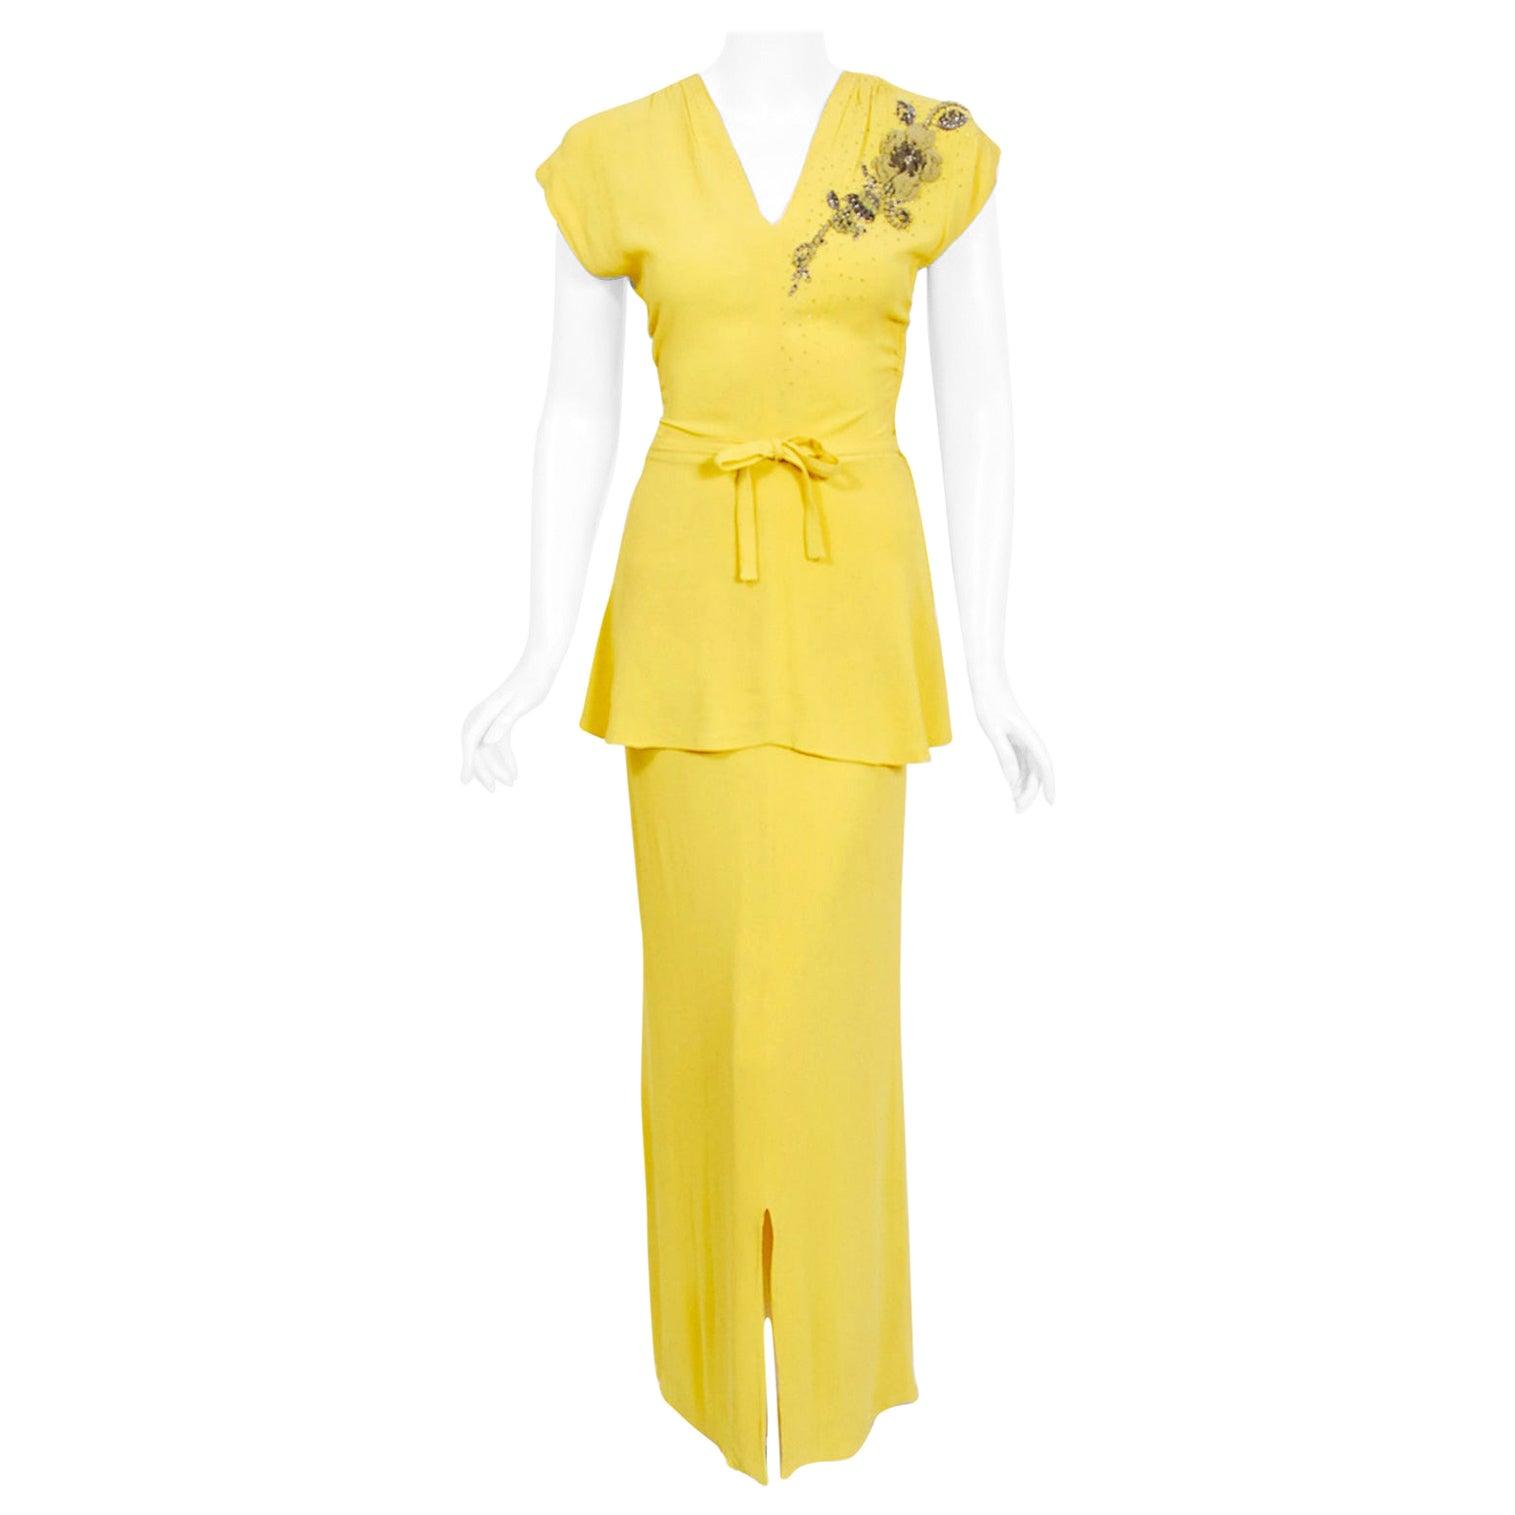 Vintage 1940's De Pinna of New York Lemon Yellow Rayon-Crepe Beaded Peplum Gown